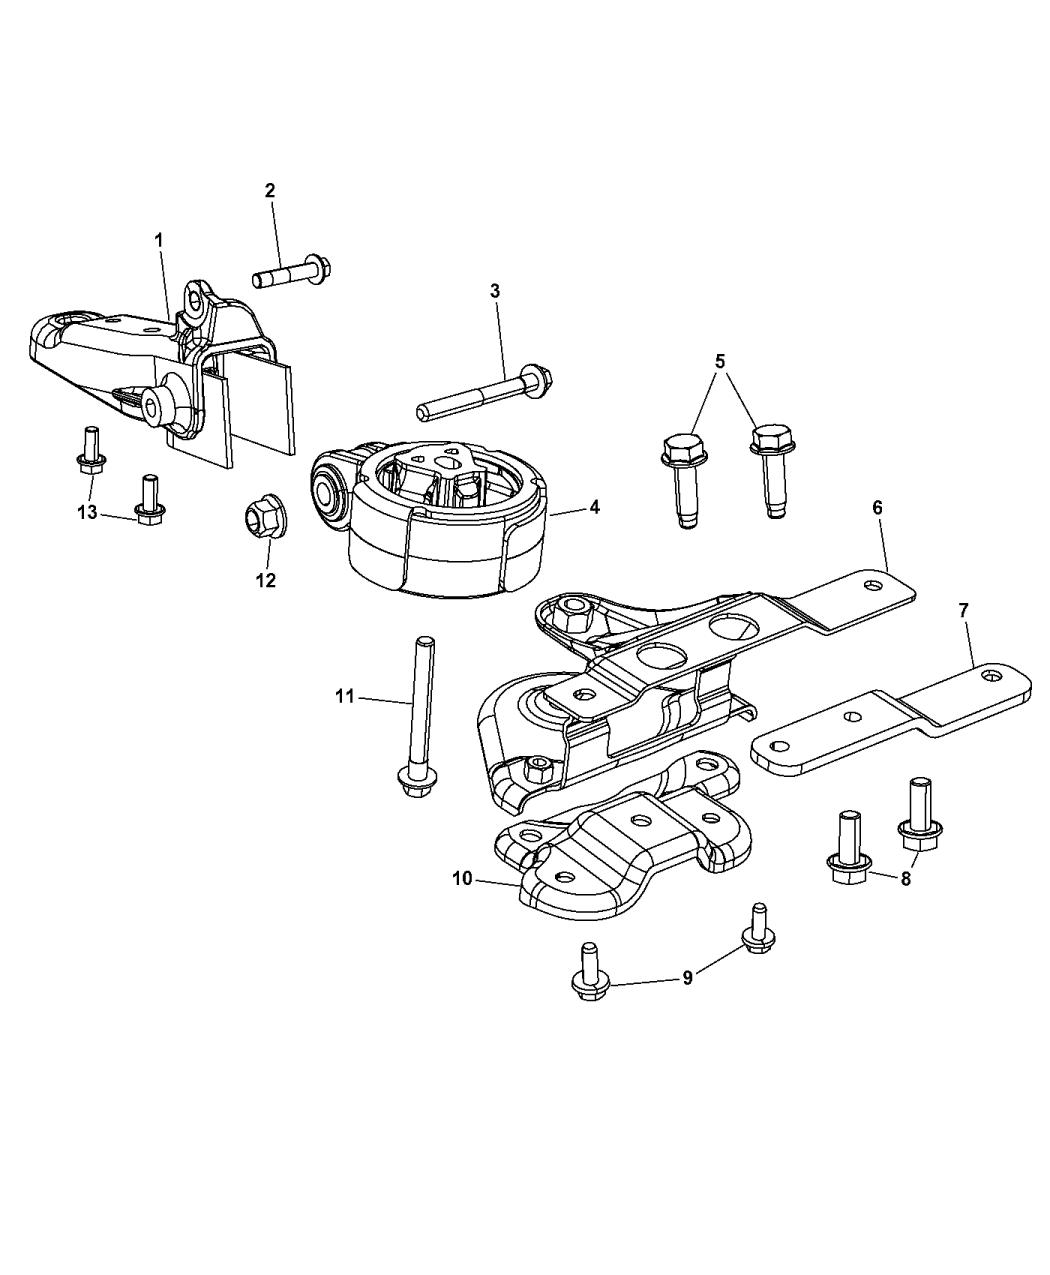 2012 Dodge Journey Engine Diagram • Wiring Diagram For Free